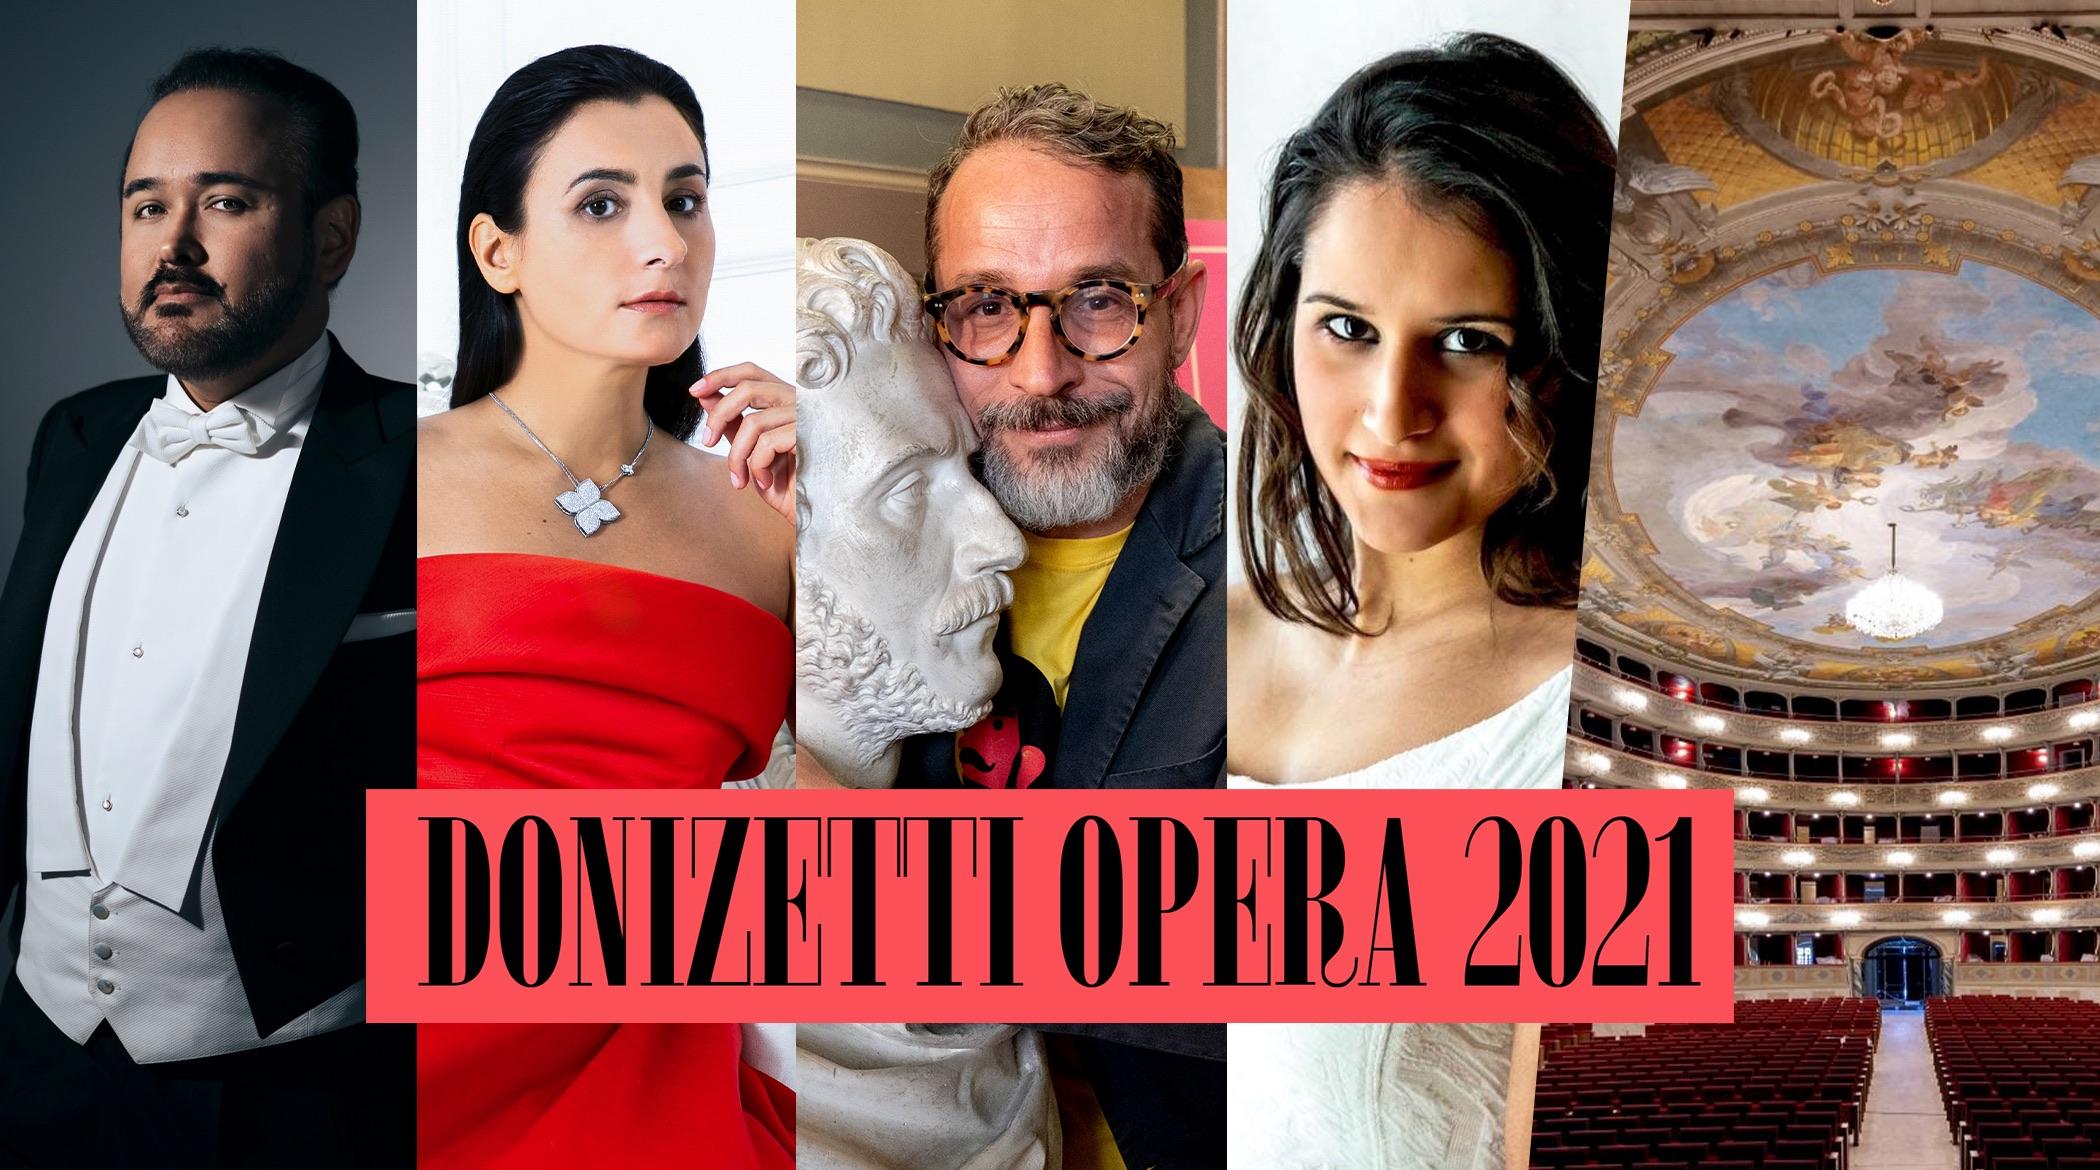 Donizetti Opera 21; DonizettiOpera21; Bergamo; Javier Camarena; Carmela Remigio; Francesco Micheli; Sara Blanch